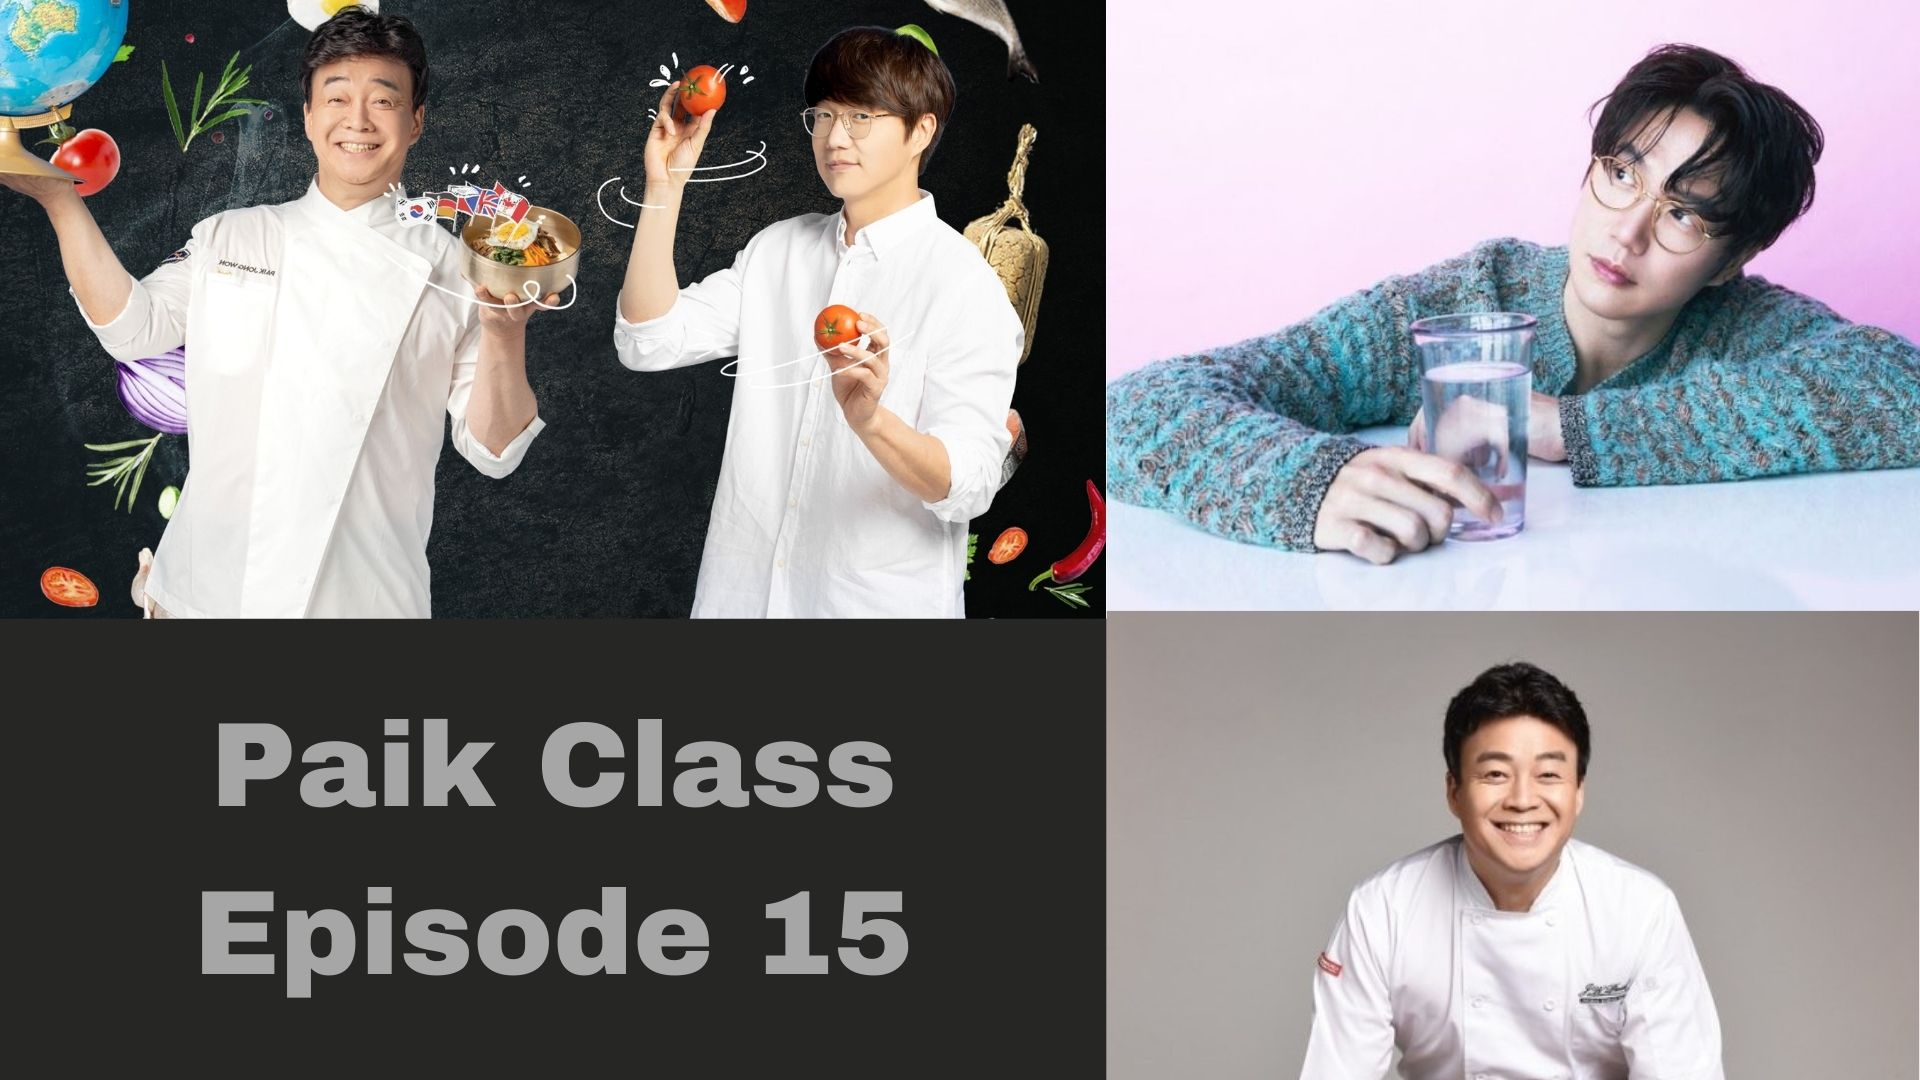 Paik Class Episode 15: Release Date & Spoilers